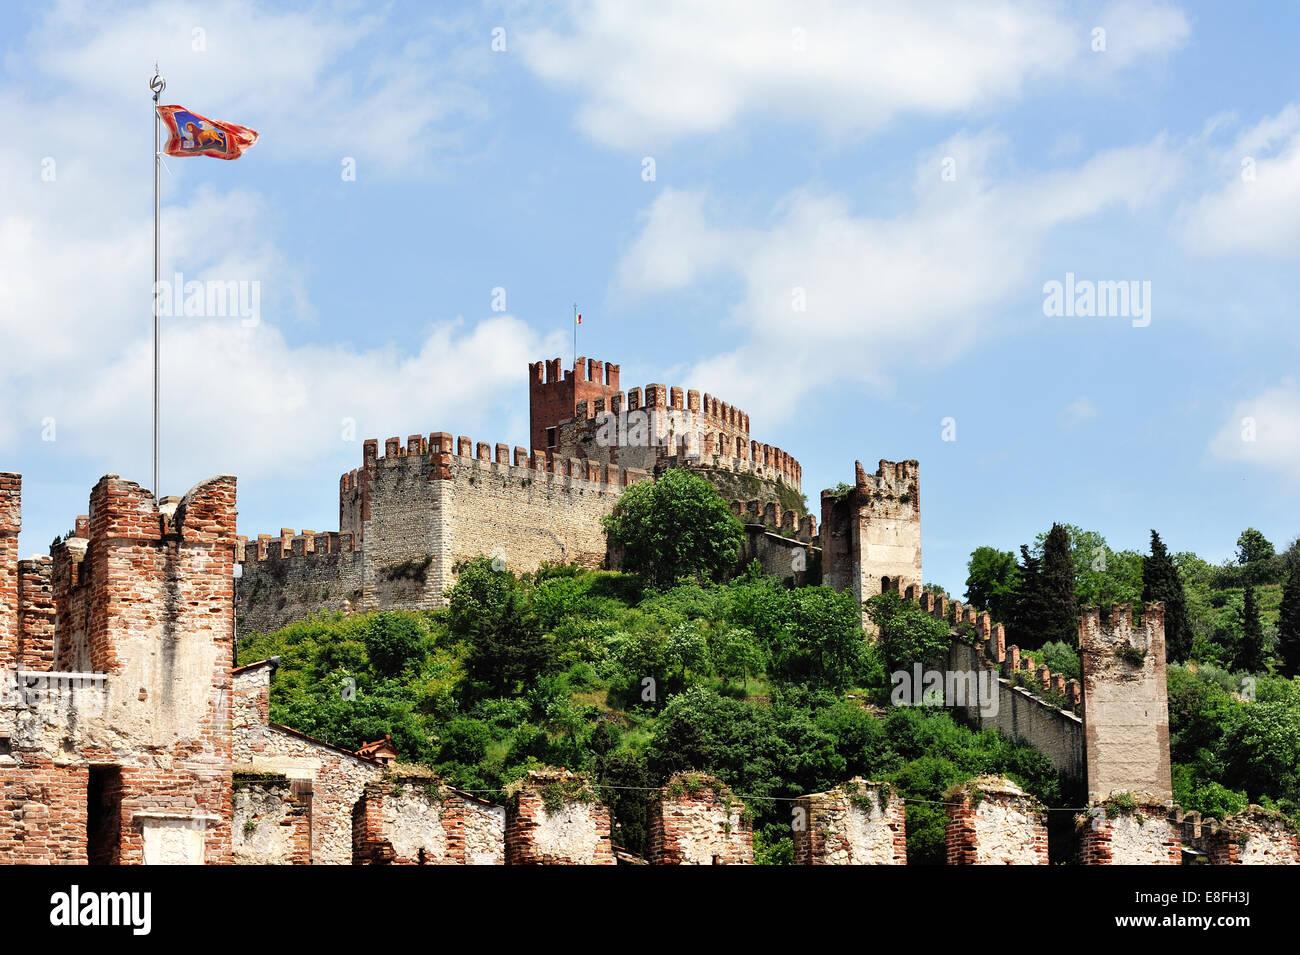 Italy, Veneto, Soave, Castle of Soave - Stock Image